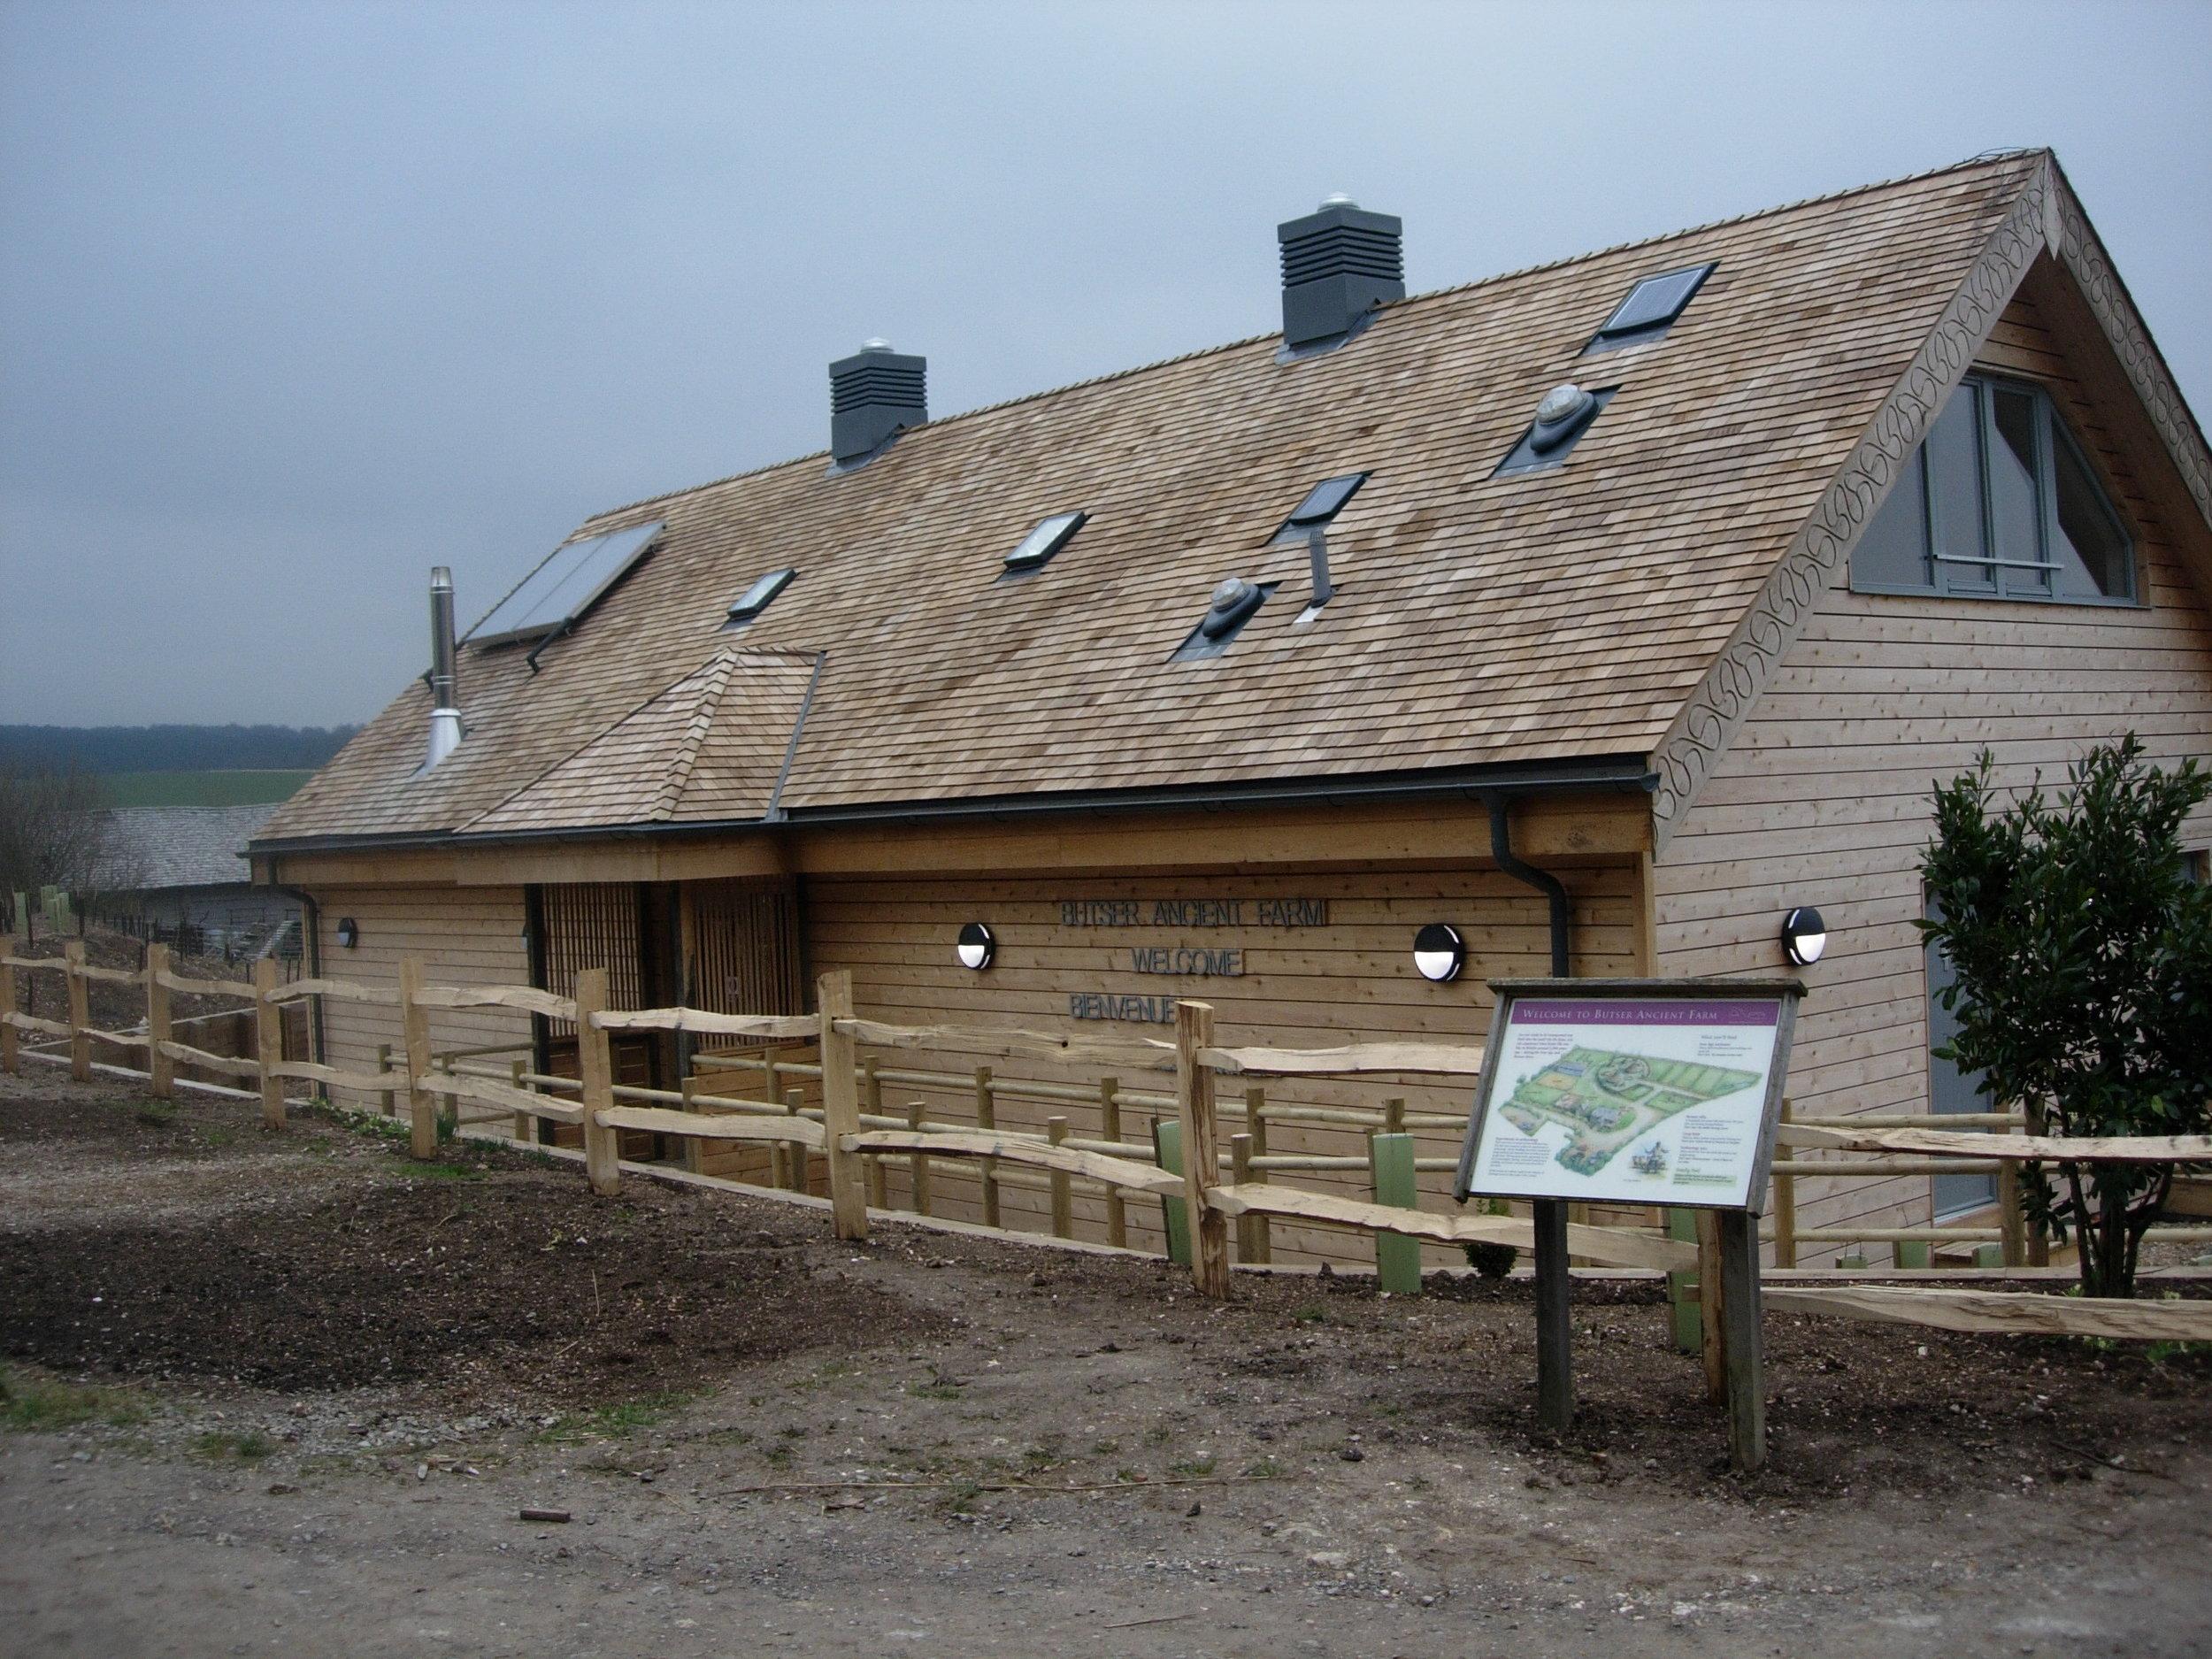 Butser Ancient Farm, Charlton